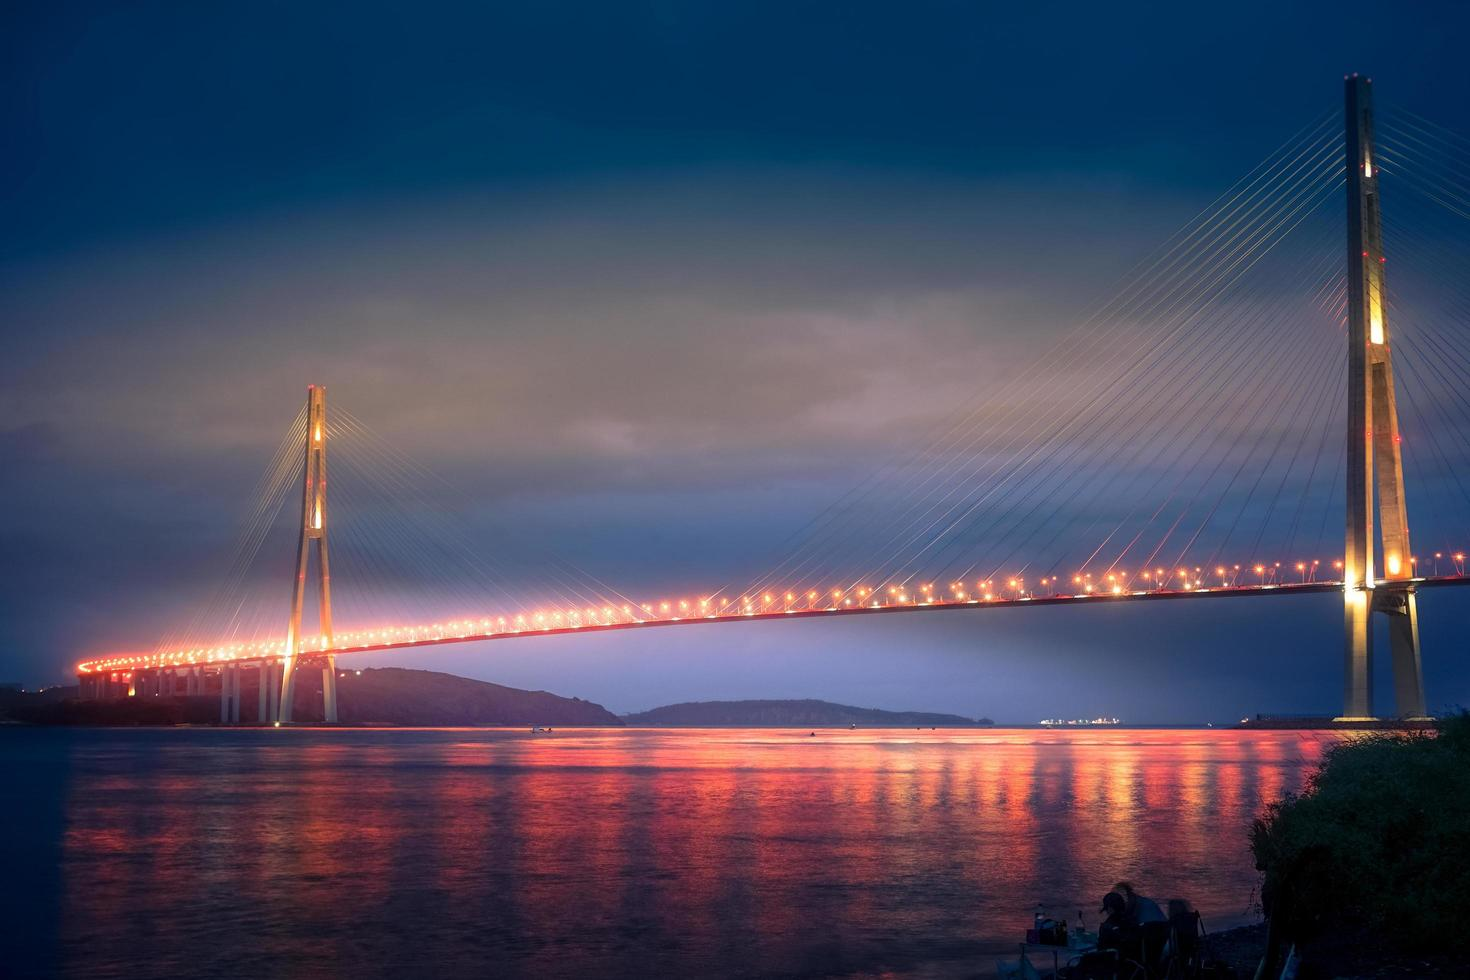 russky brug 's nachts in vladivostok, rusland foto